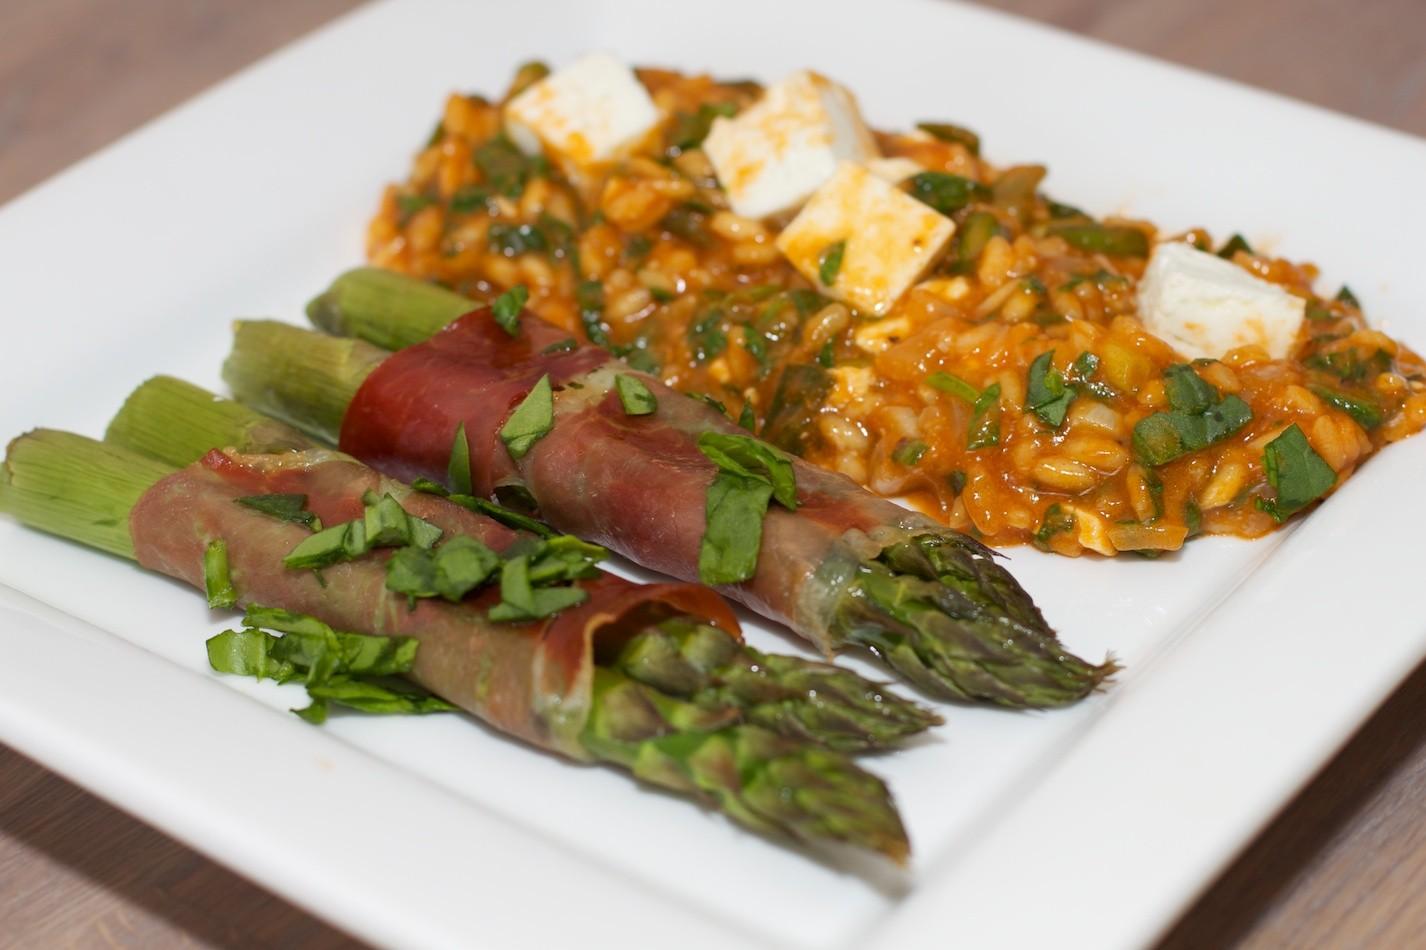 Spinazie risotto met asperges gewikkeld in Seranoham